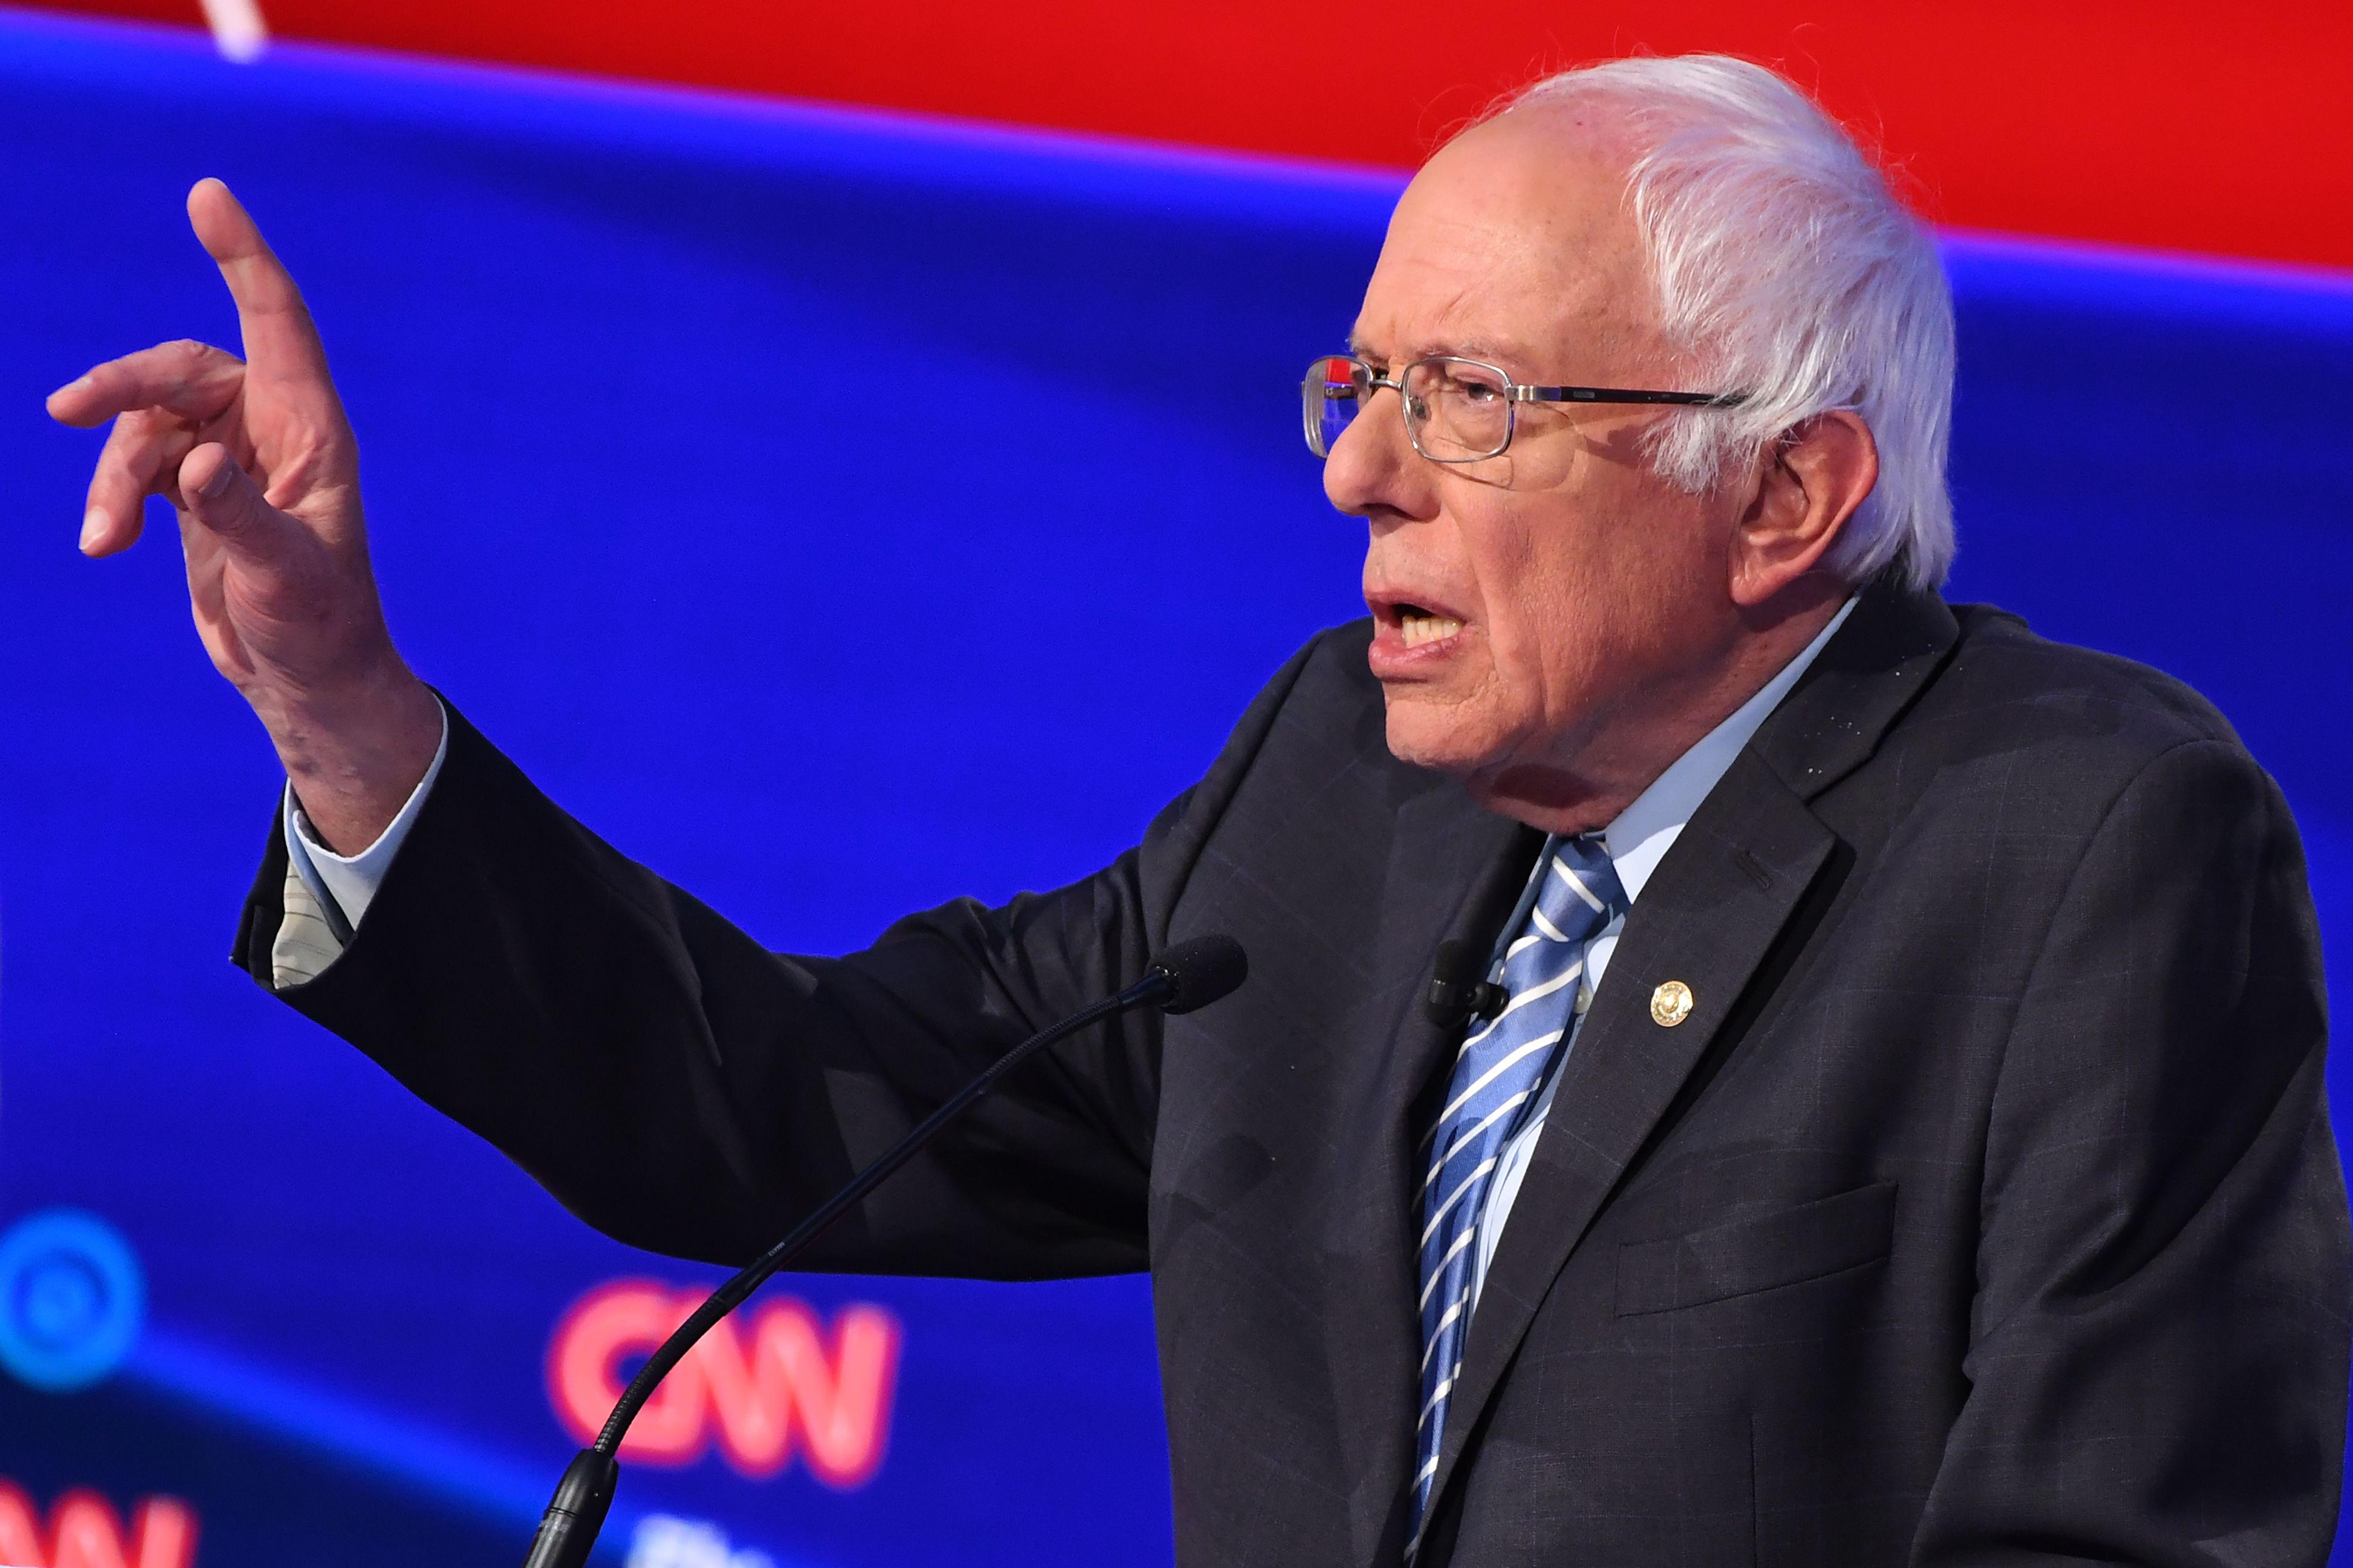 Bernie Sanders at Debate After Heart Attack: 'I'm Healthy'